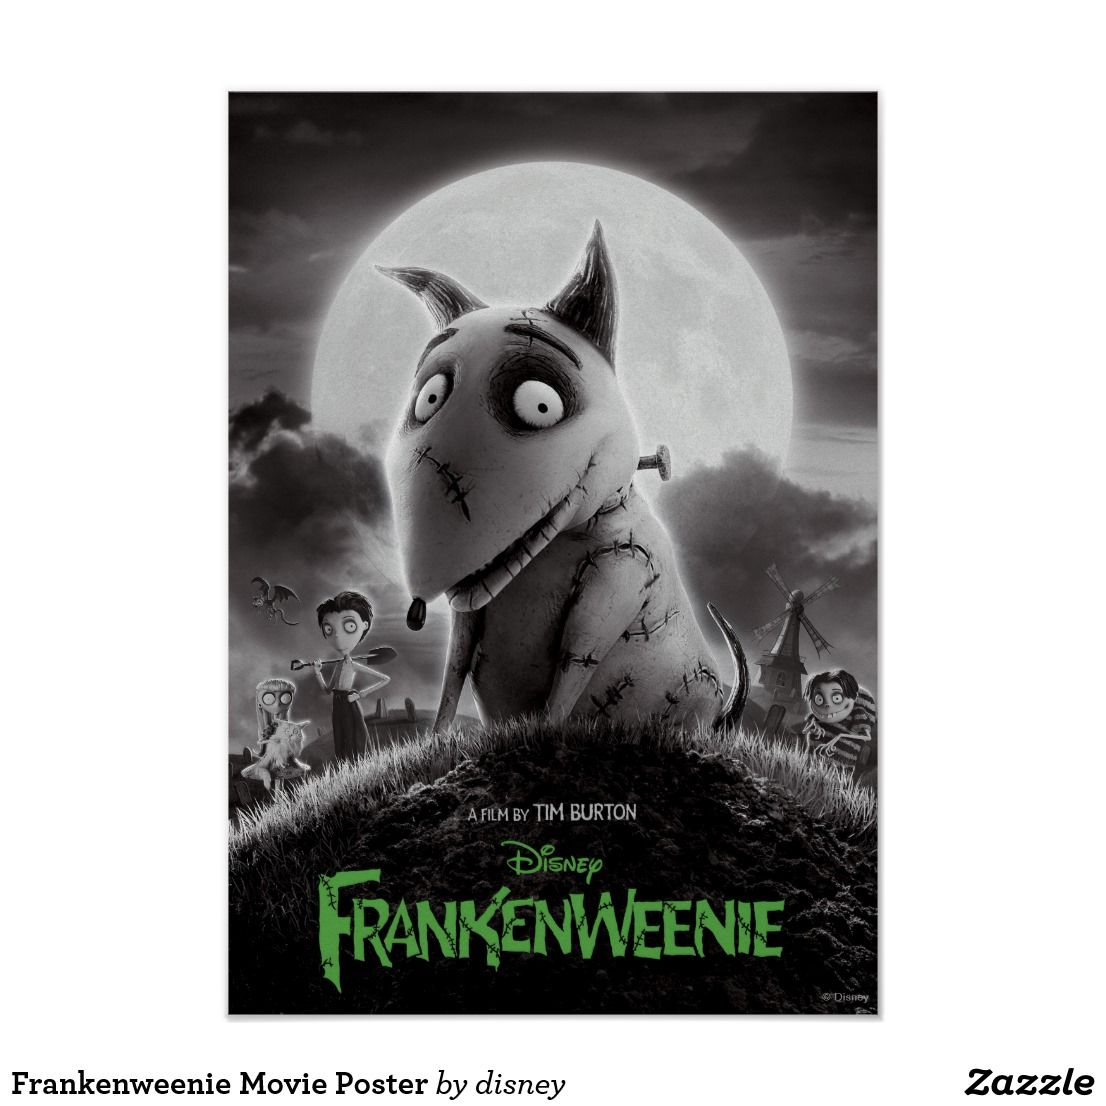 Frankenweenie Movie Poster Zazzle Com In 2020 Tim Burton Movie Halloween Movies Tim Burton Disney